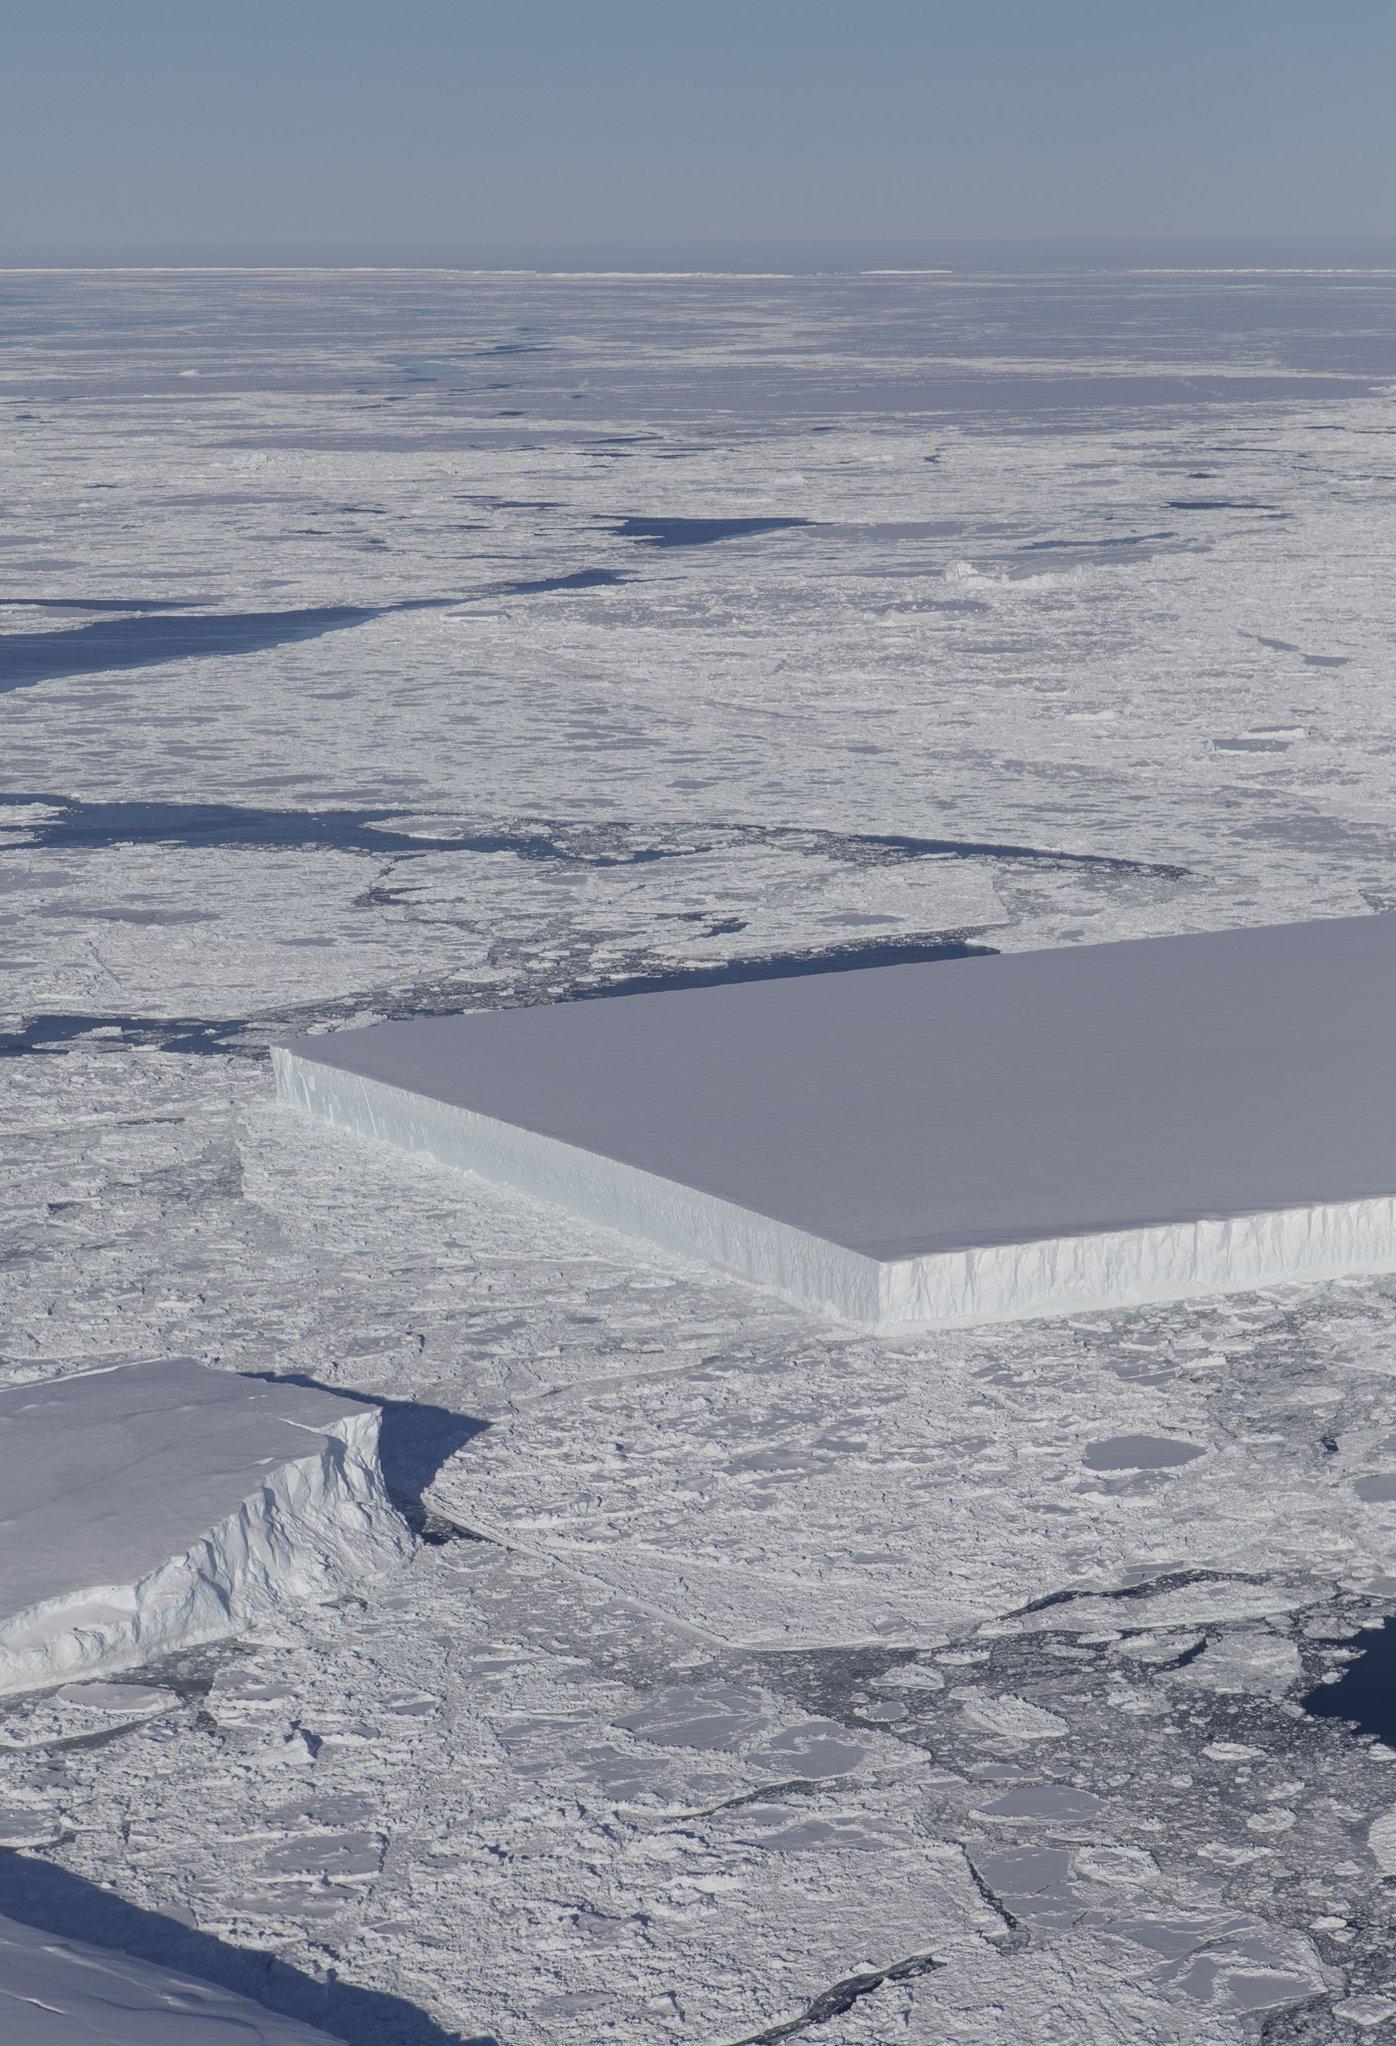 Antarctic iceberg snapped by NASA.